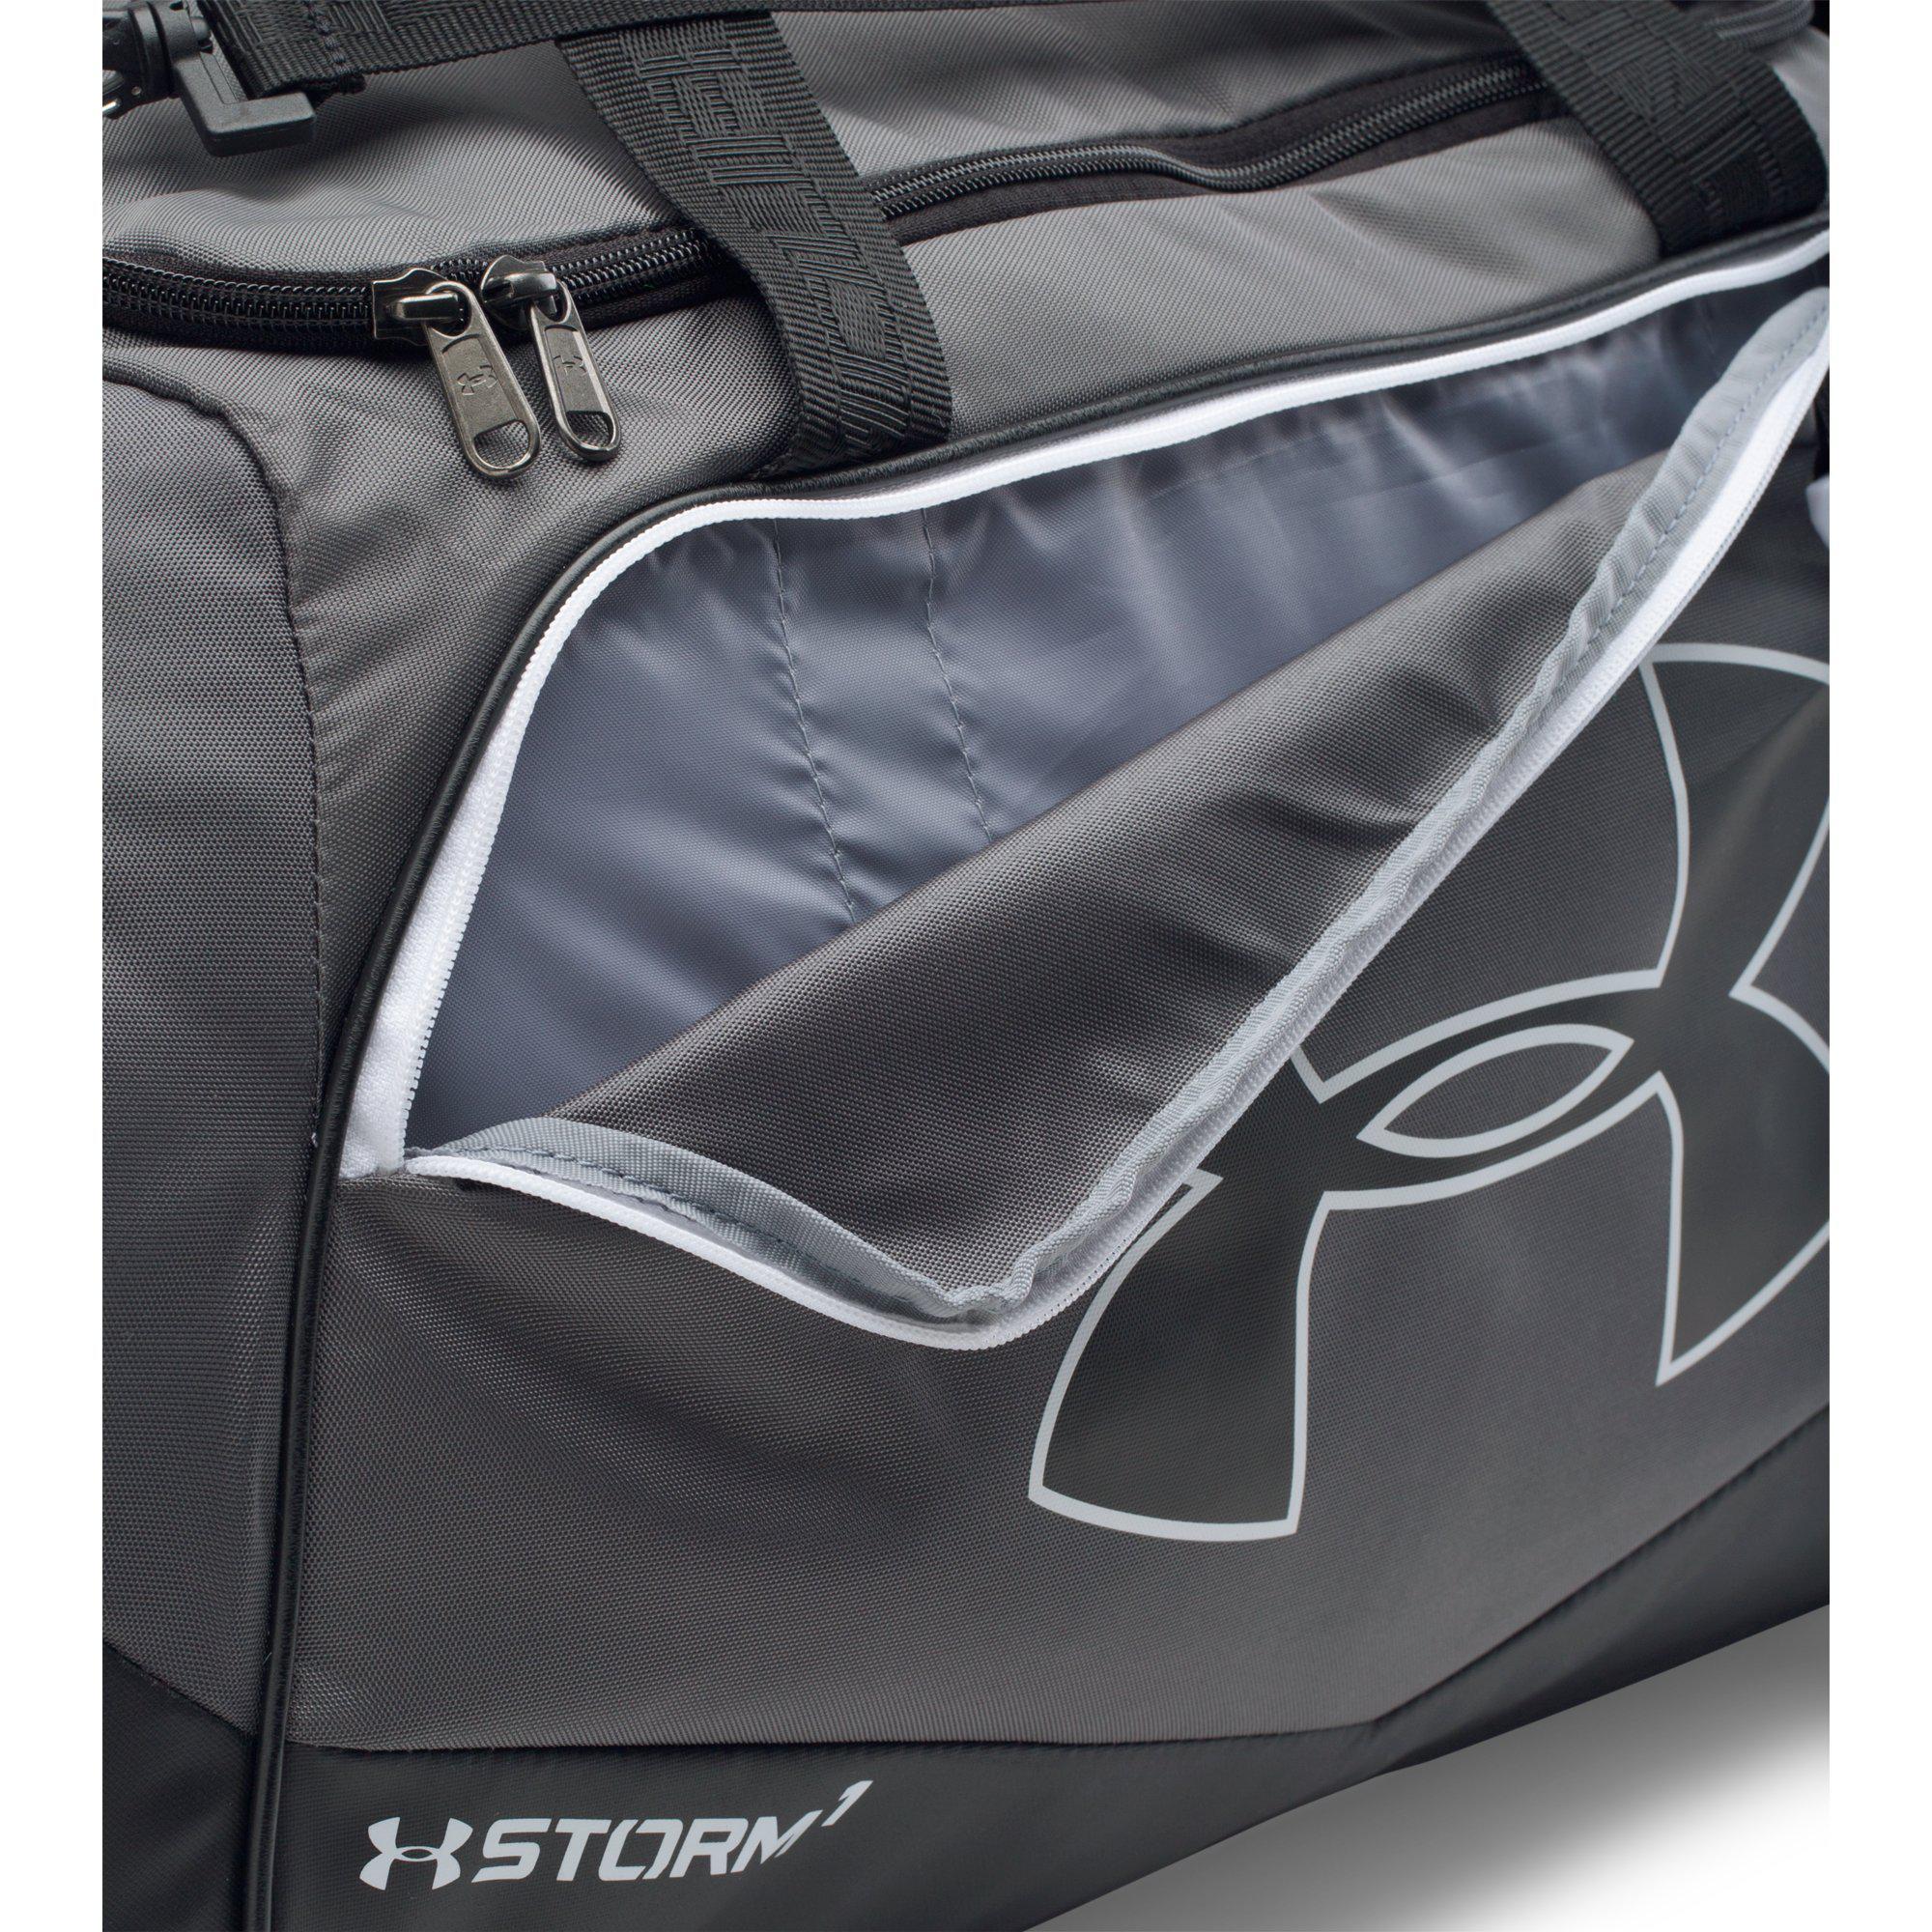 509d56cd06f Under Armour Storm Undeniable II LG Duffel Bag - Graphite ...